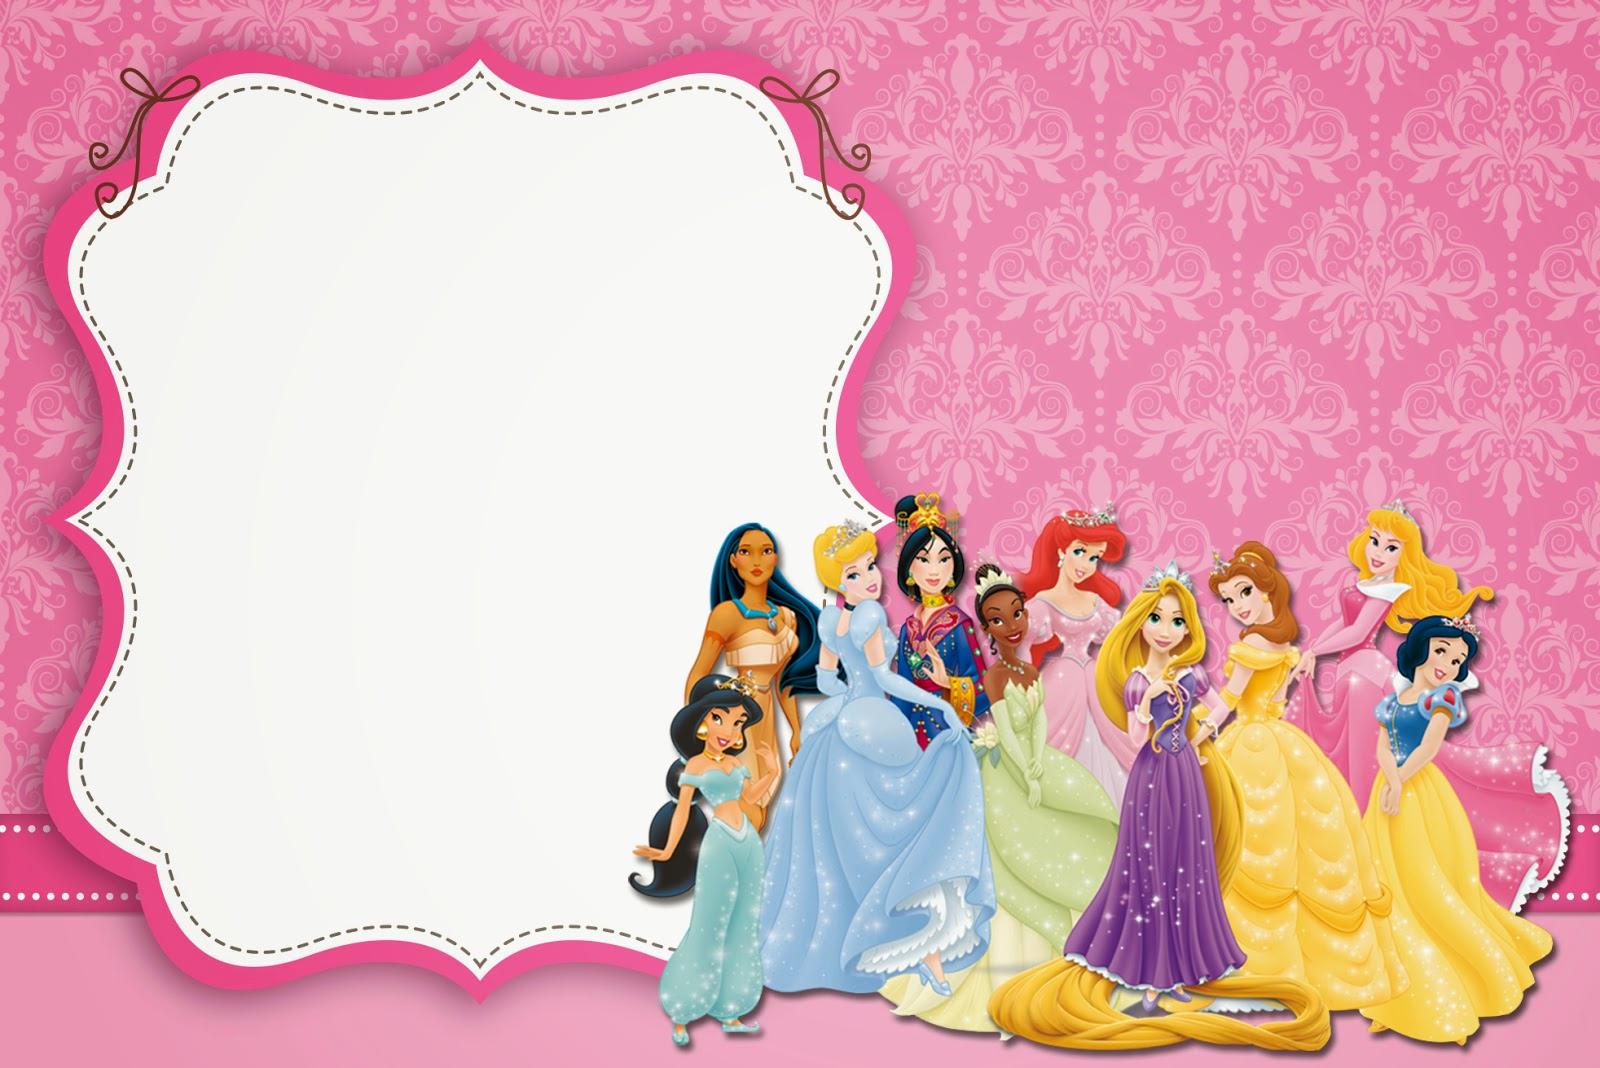 Free Disney Princess Invitation Template Best Of Disney Princess Party Free Printable Party Invitations